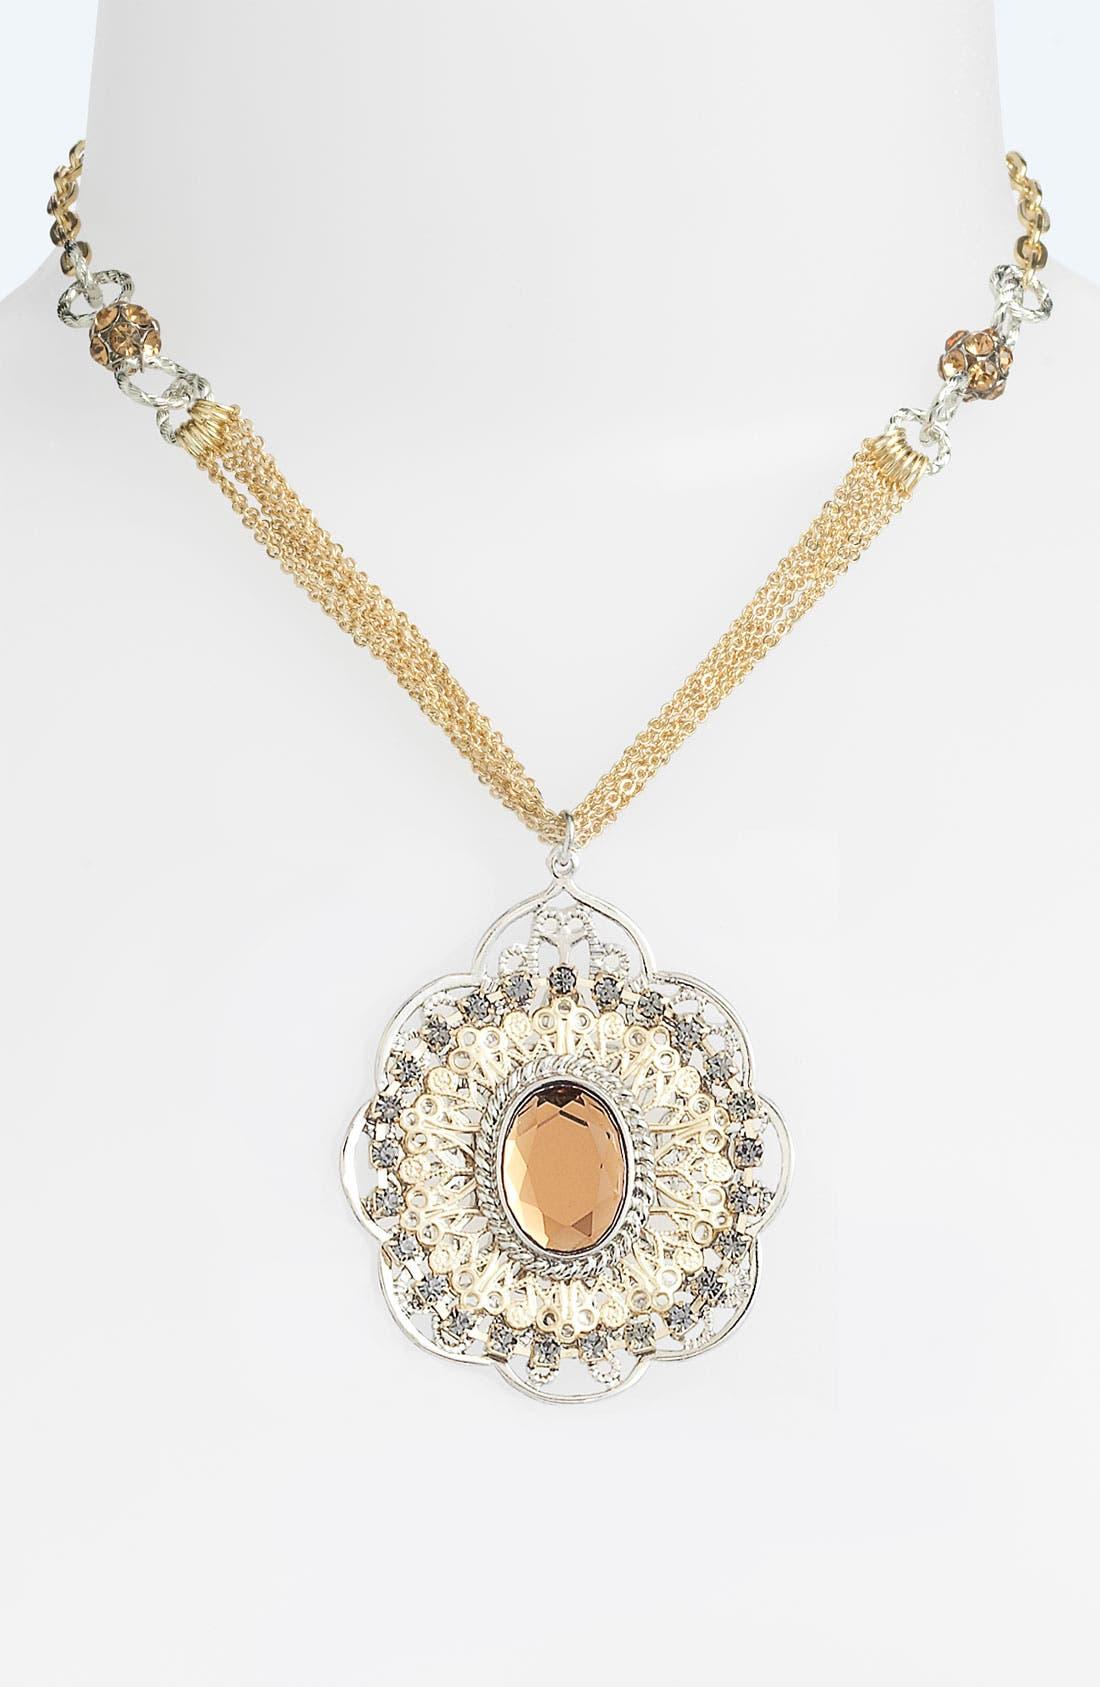 Alternate Image 1 Selected - Nordstrom 'Romantics' Pendant Necklace